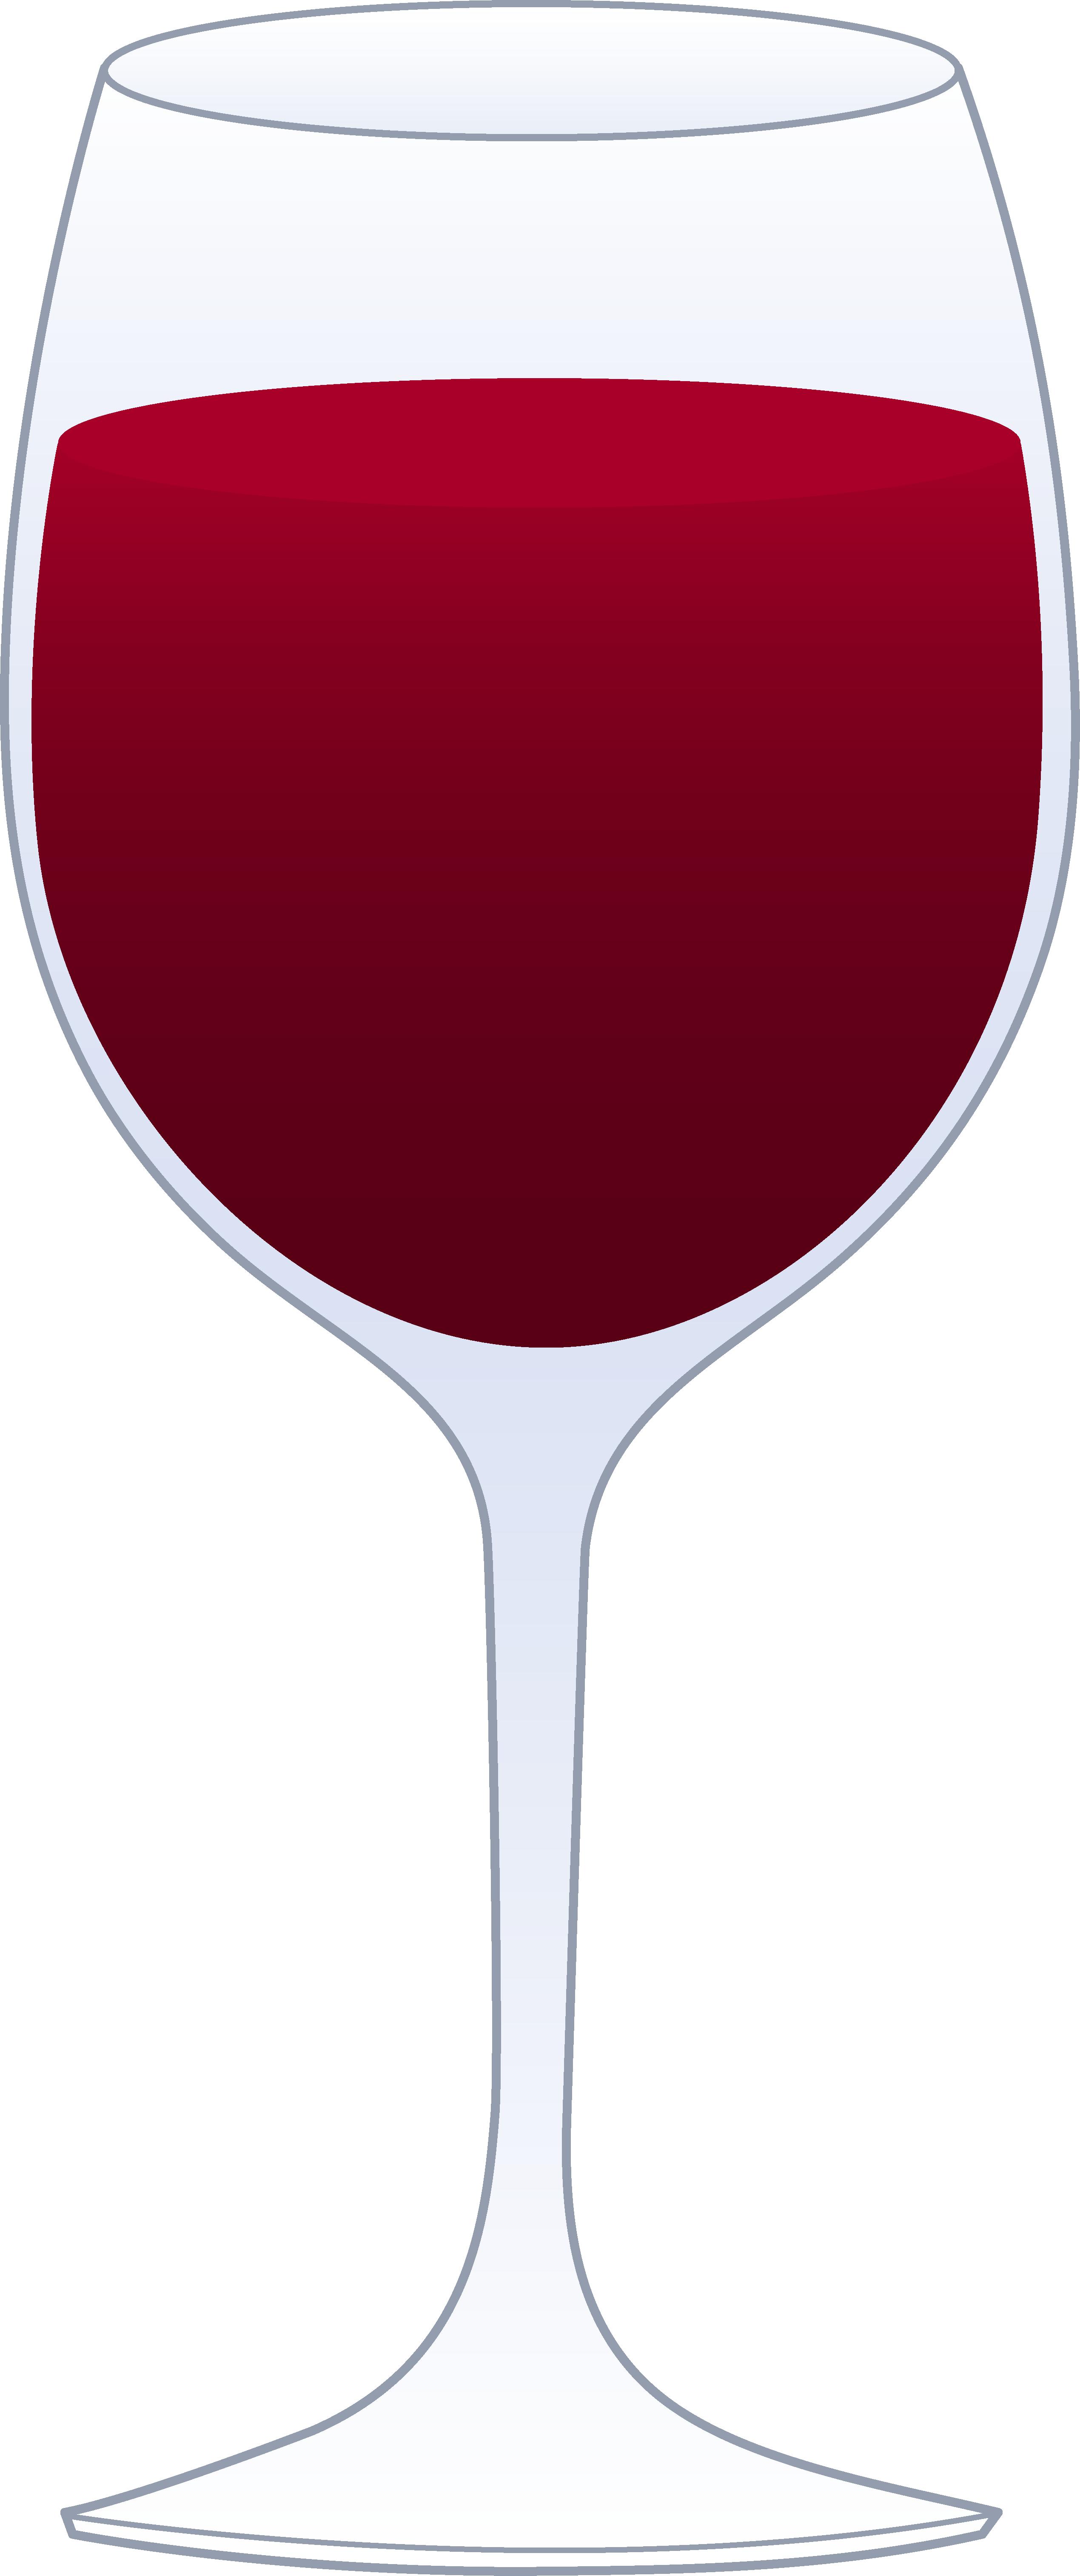 Free Wine Clip Art Image